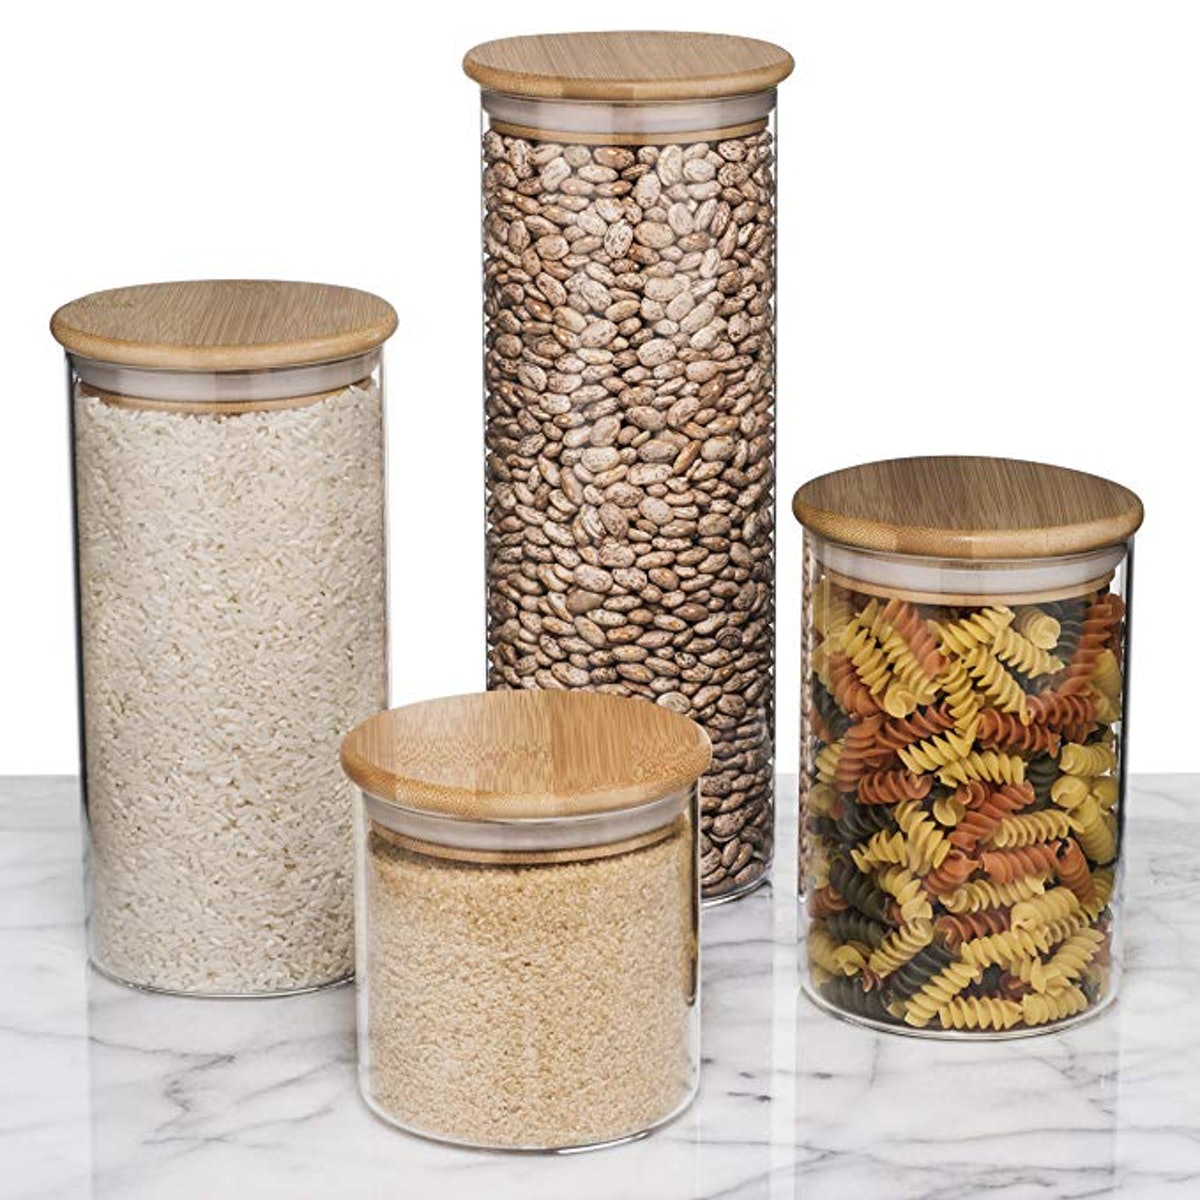 Sweetzer & Orange Glass Food Storage Containers (4-Piece)